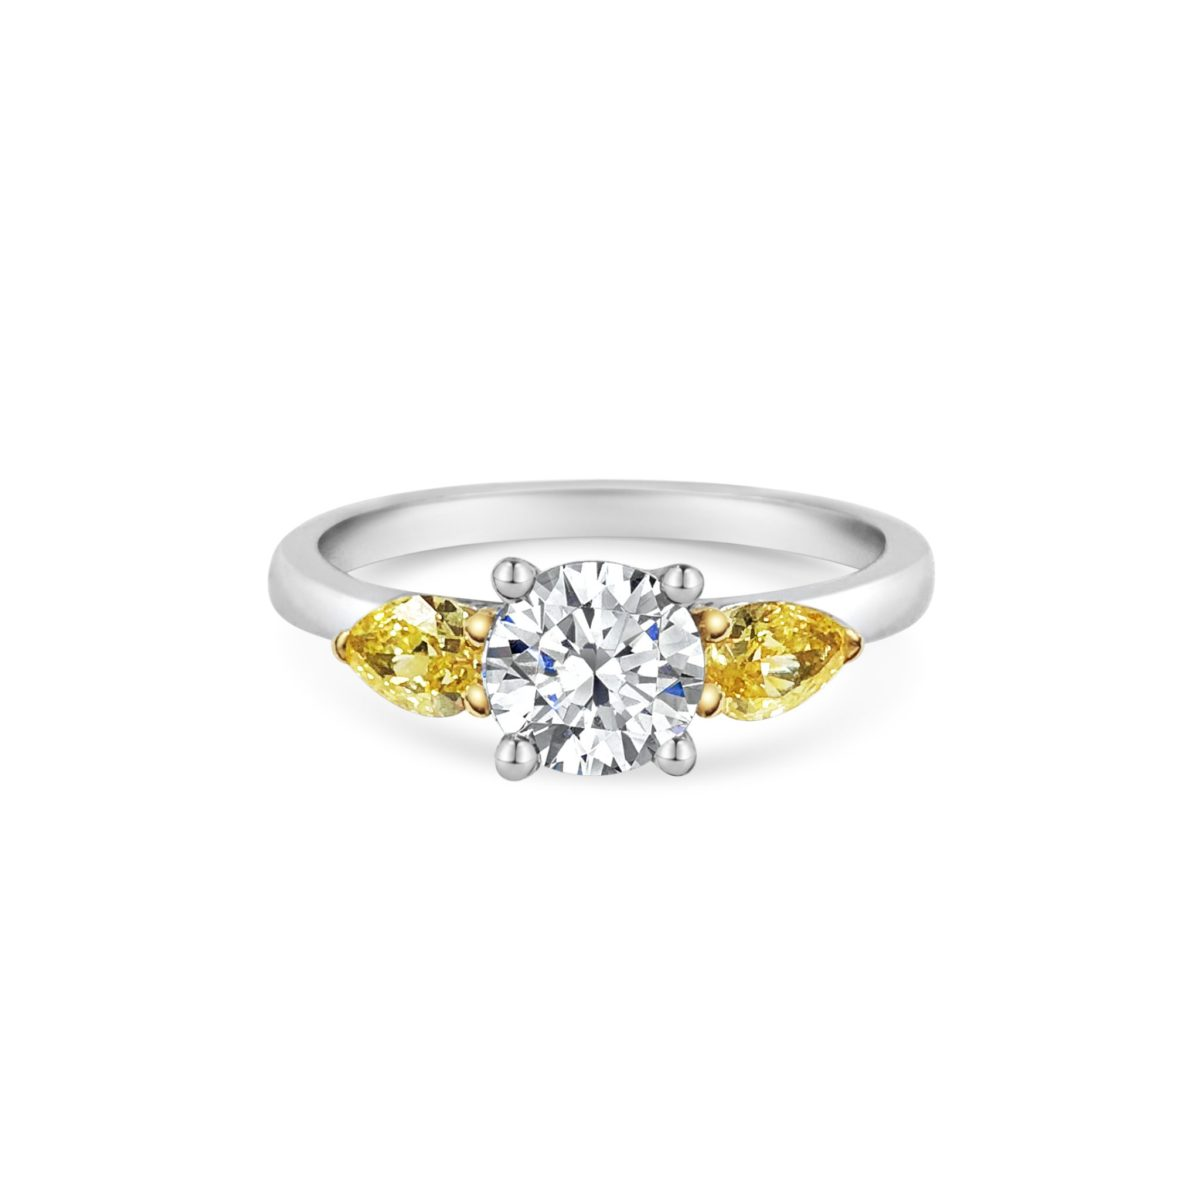 Taylor Round Cut Diamond Natural Fancy Intense Yellow Pear Diamond Three Stone Engagement Ring